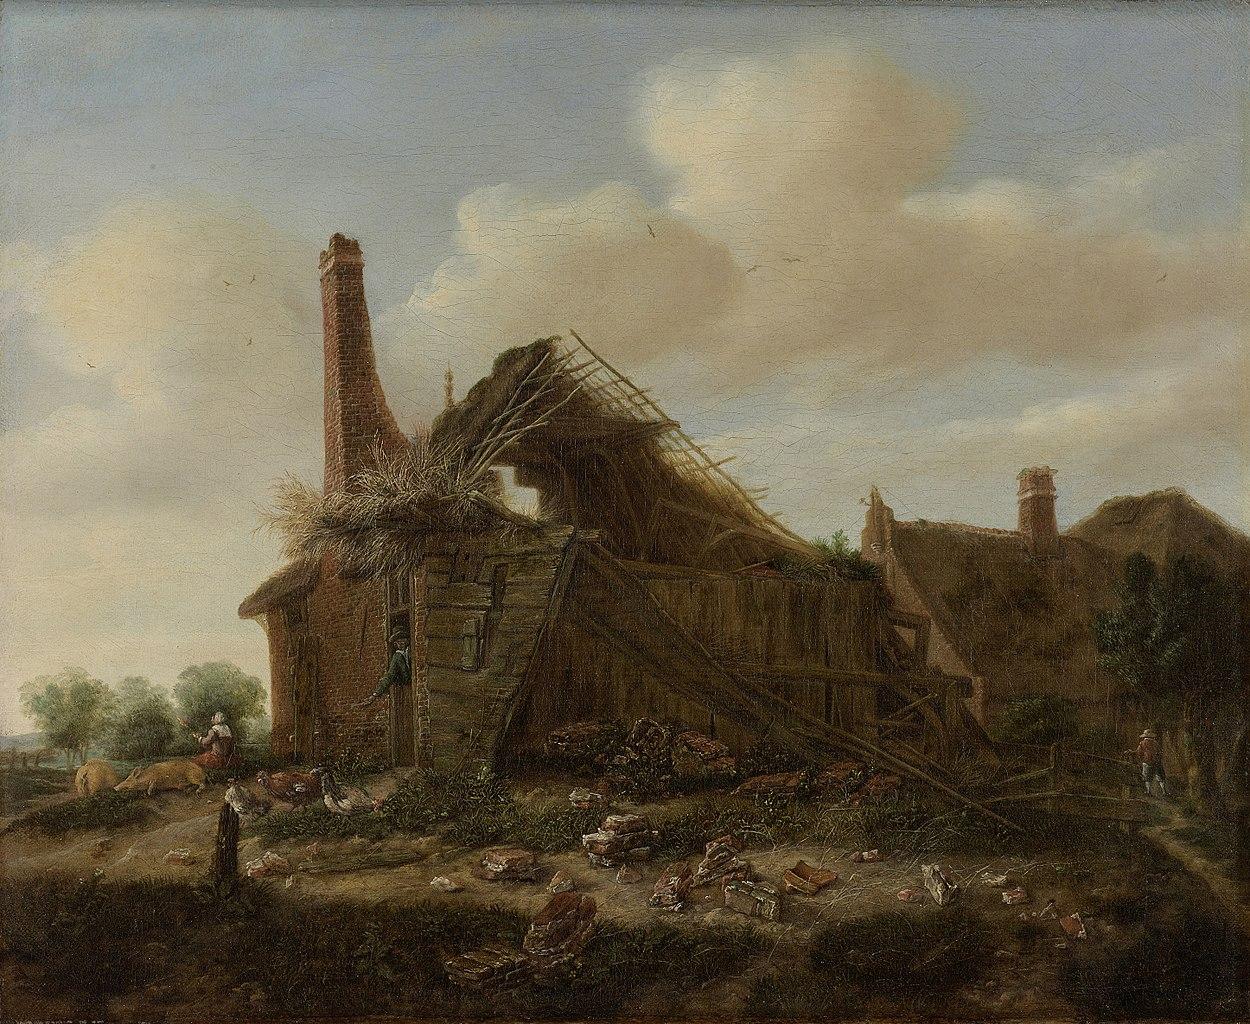 Emanuel Murant, Farmhouse in Ruins, ca. 1650-1700, oil on canvas, Rijksmuseum, Amsterdam.